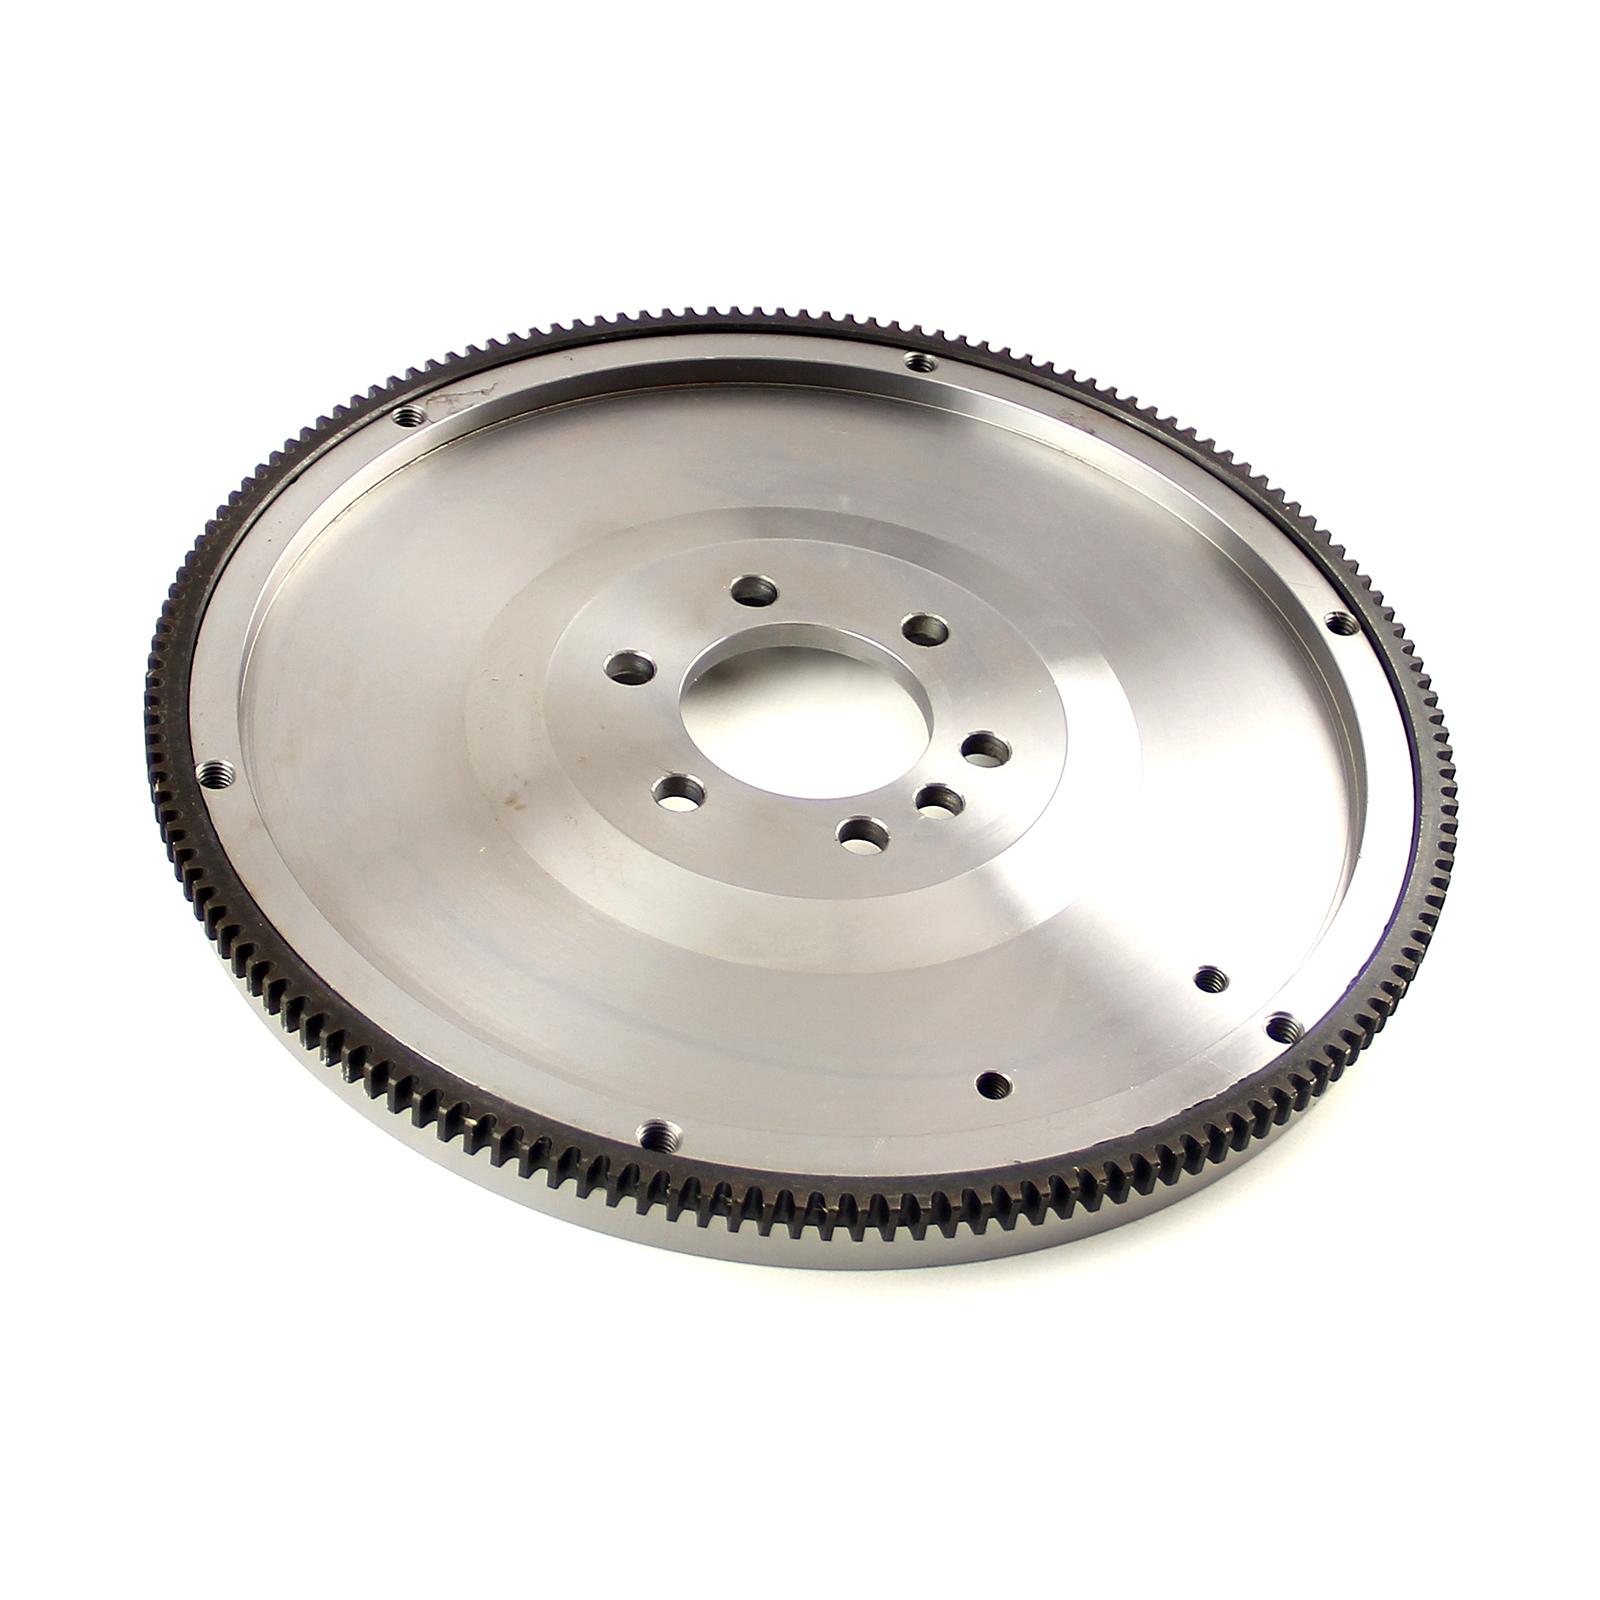 "Chevy SBC 350 2Pc Rms 153 Tooth 10"" Internal Bal. Billet Steel SFI Flywheel"